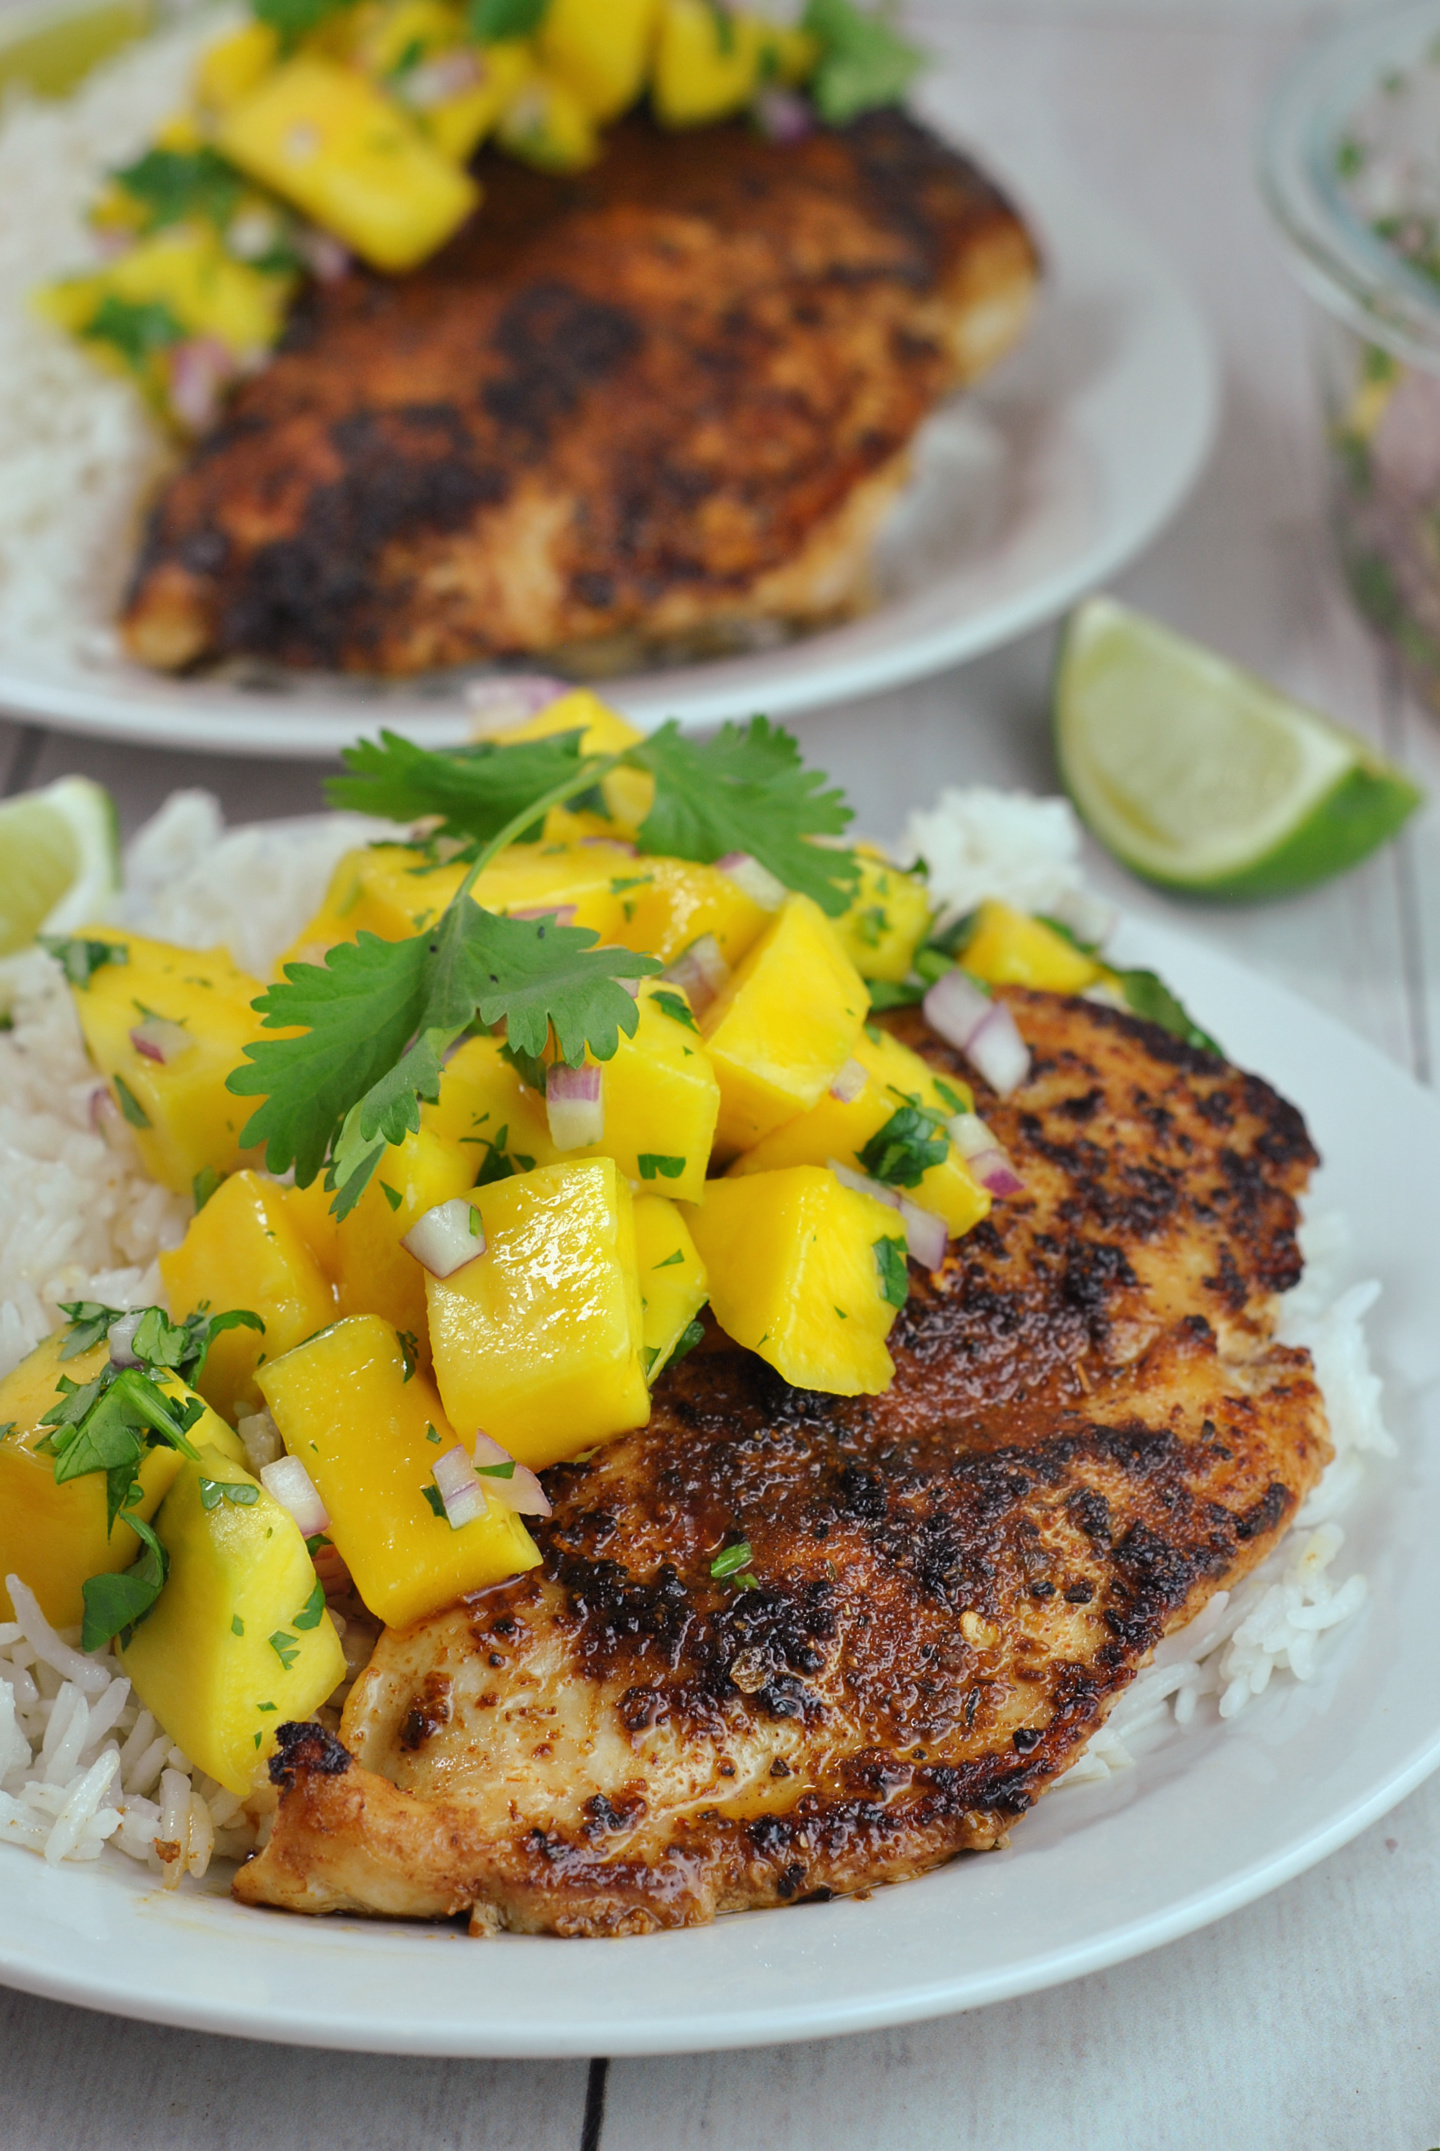 Jerk Chicken Bowls with Mango Salsa and Coconut Rice via @preventionrd